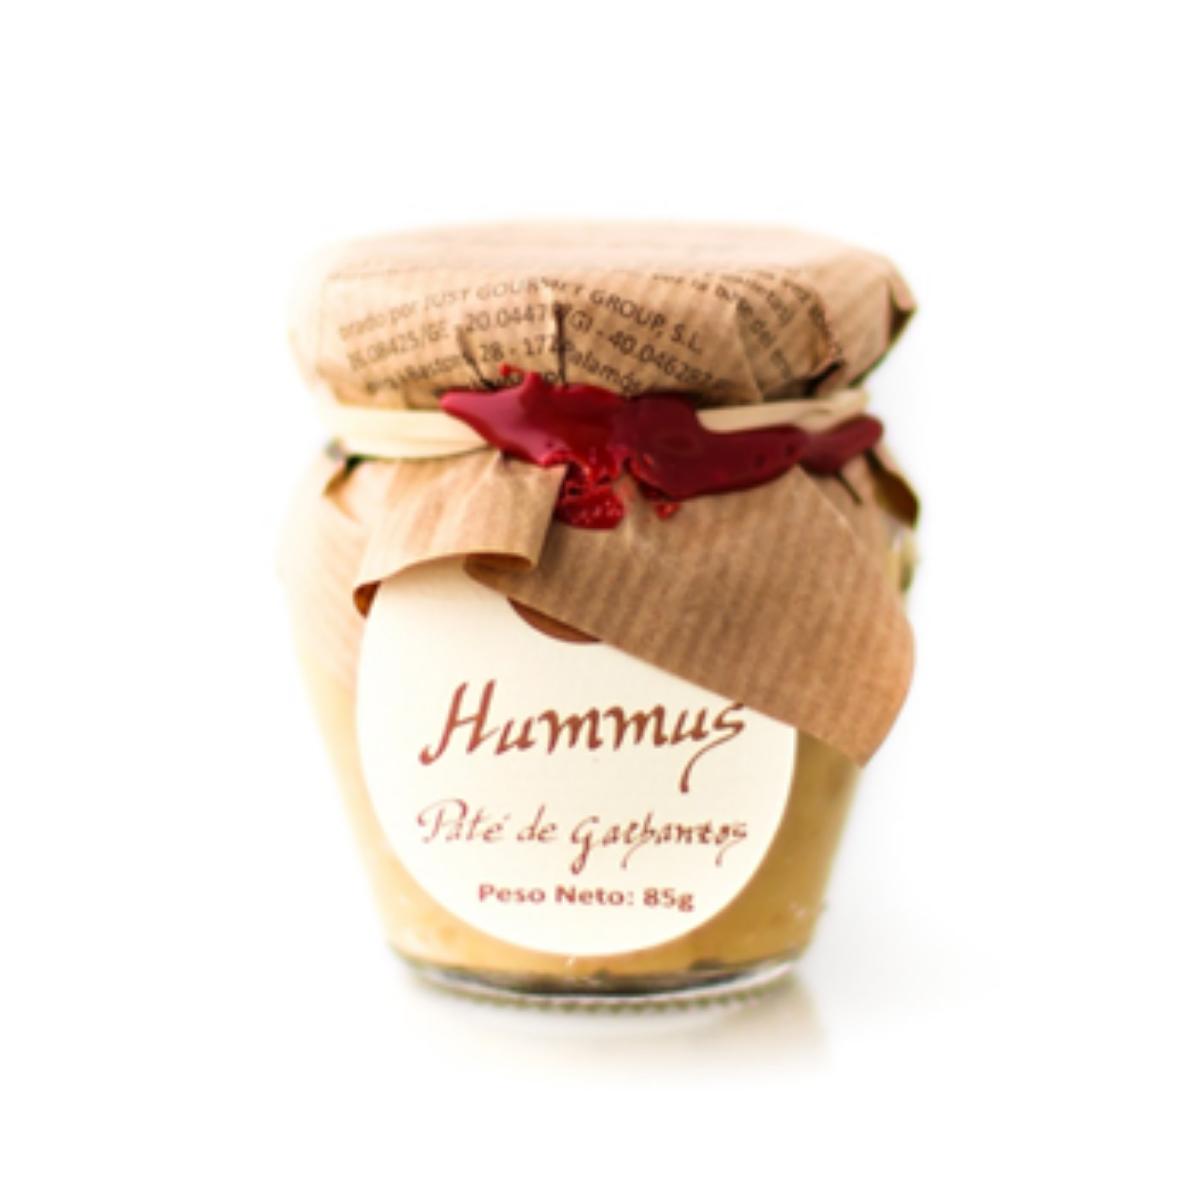 Hummus Paté de Garbanzos La Cuna